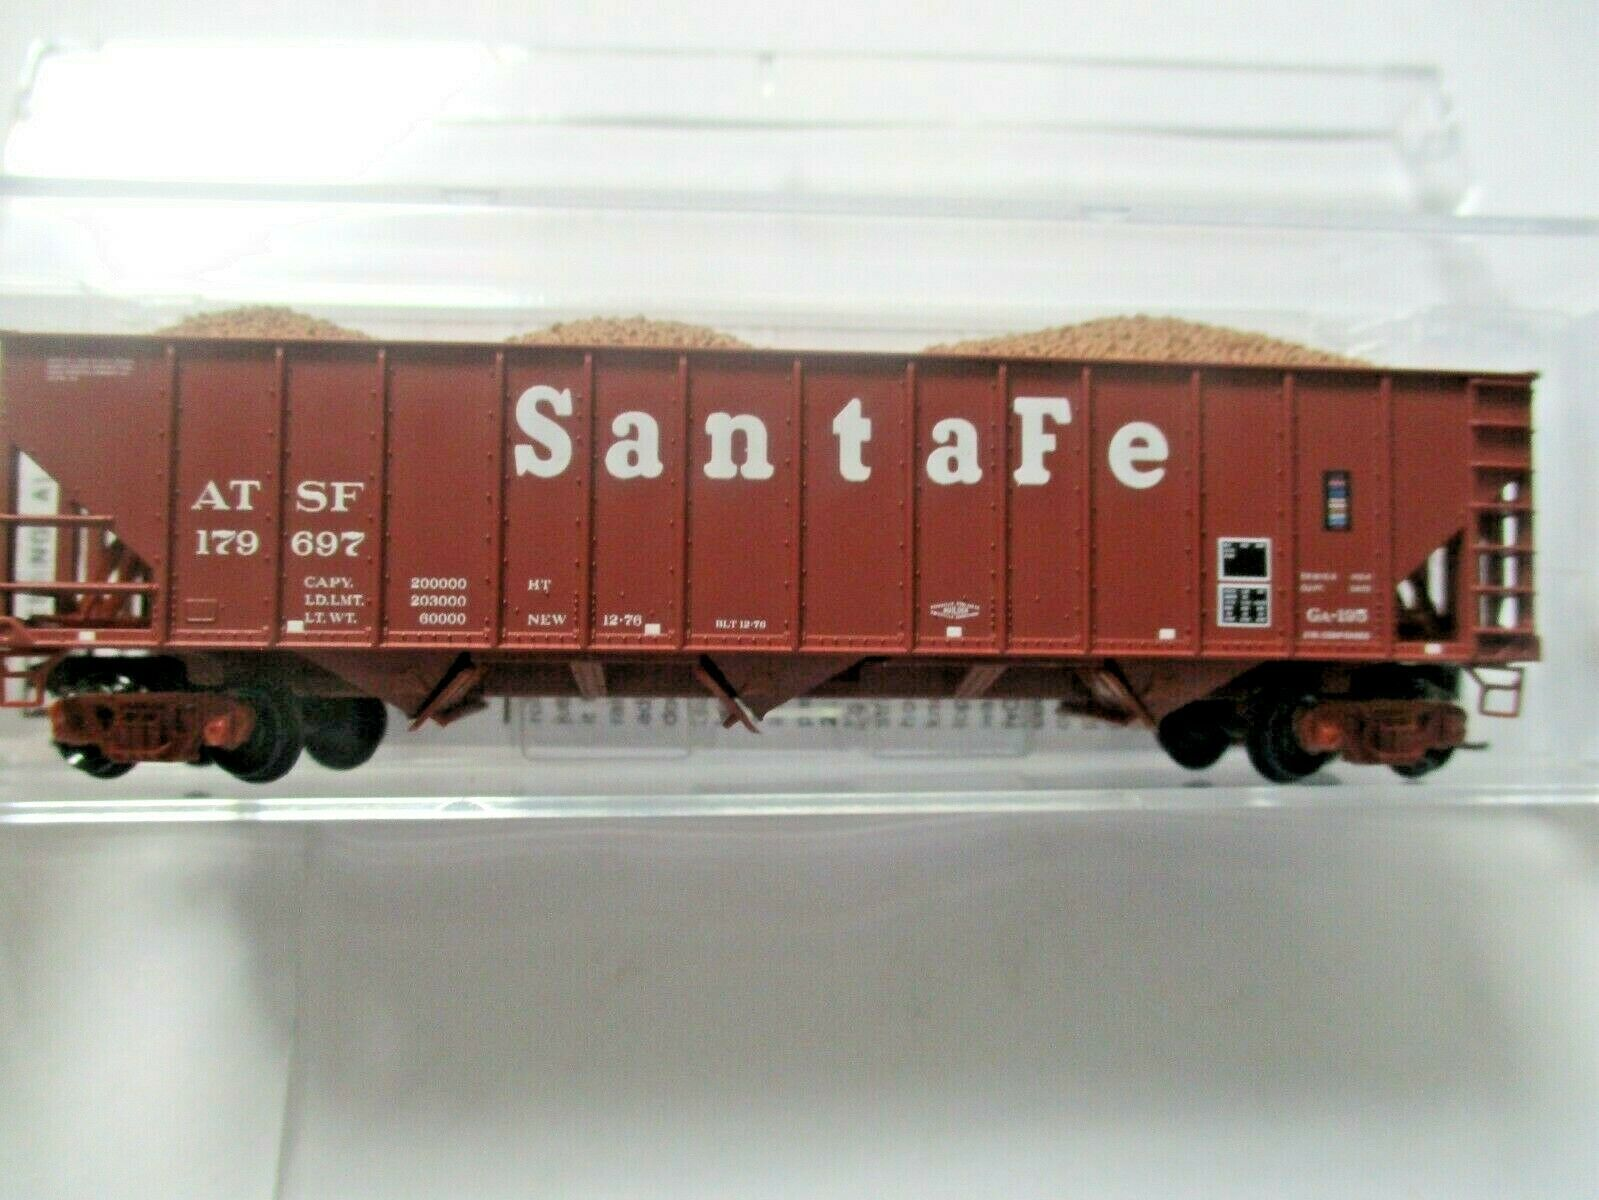 Micro-Trains # 10800124 Atchison, Topeka & Santa Fe 100 Ton 3-Bay Hopper N-Scale